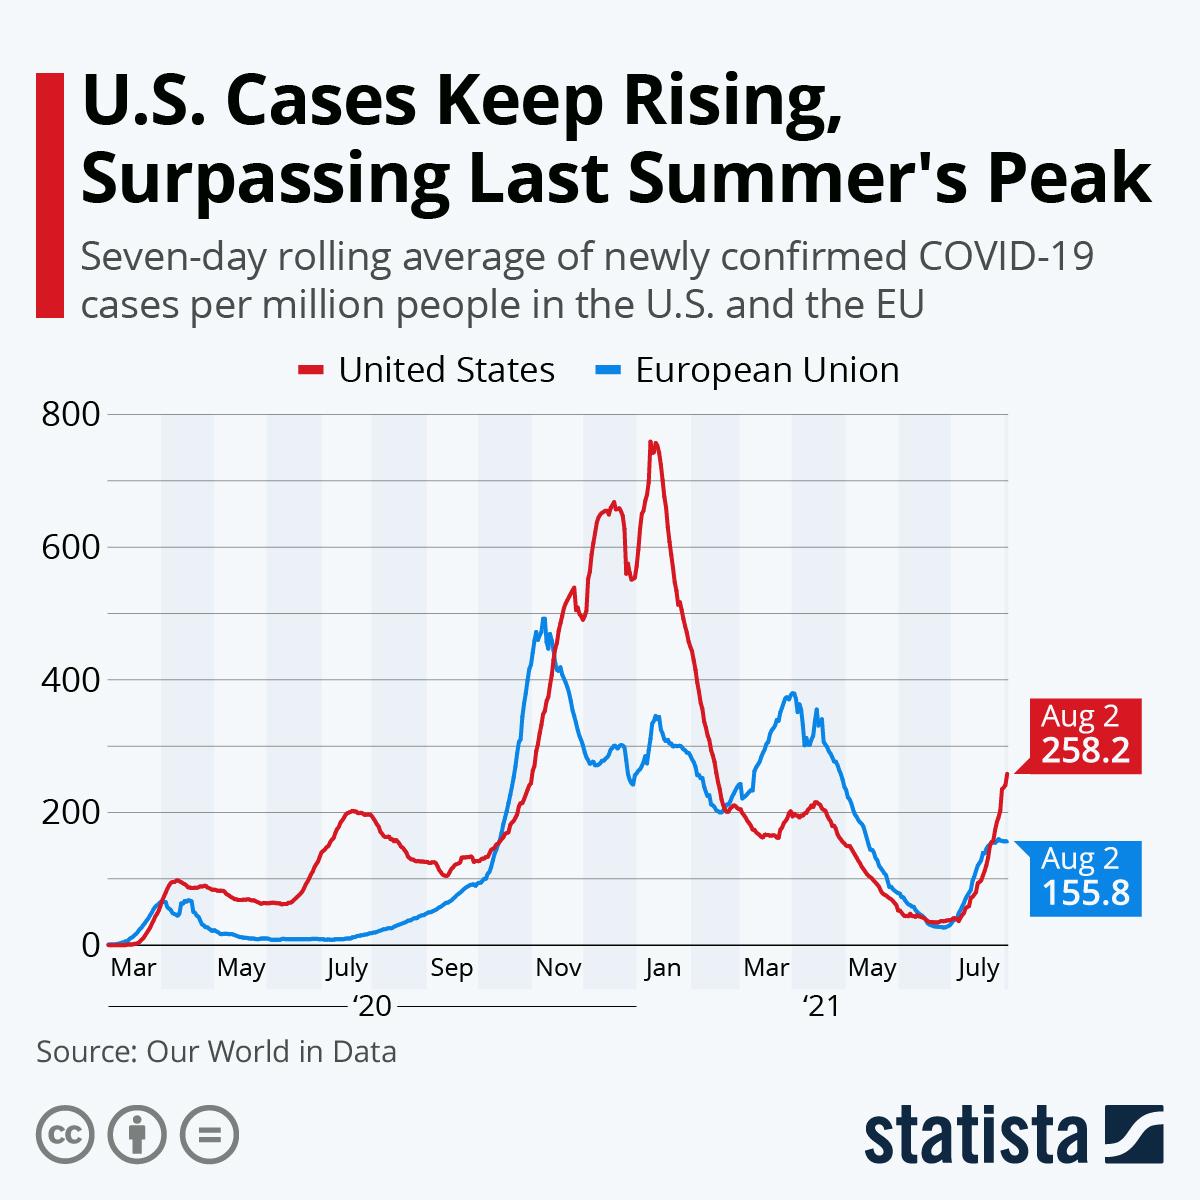 U.S. Cases Keep Rising, Surpassing Last Summer's Peak